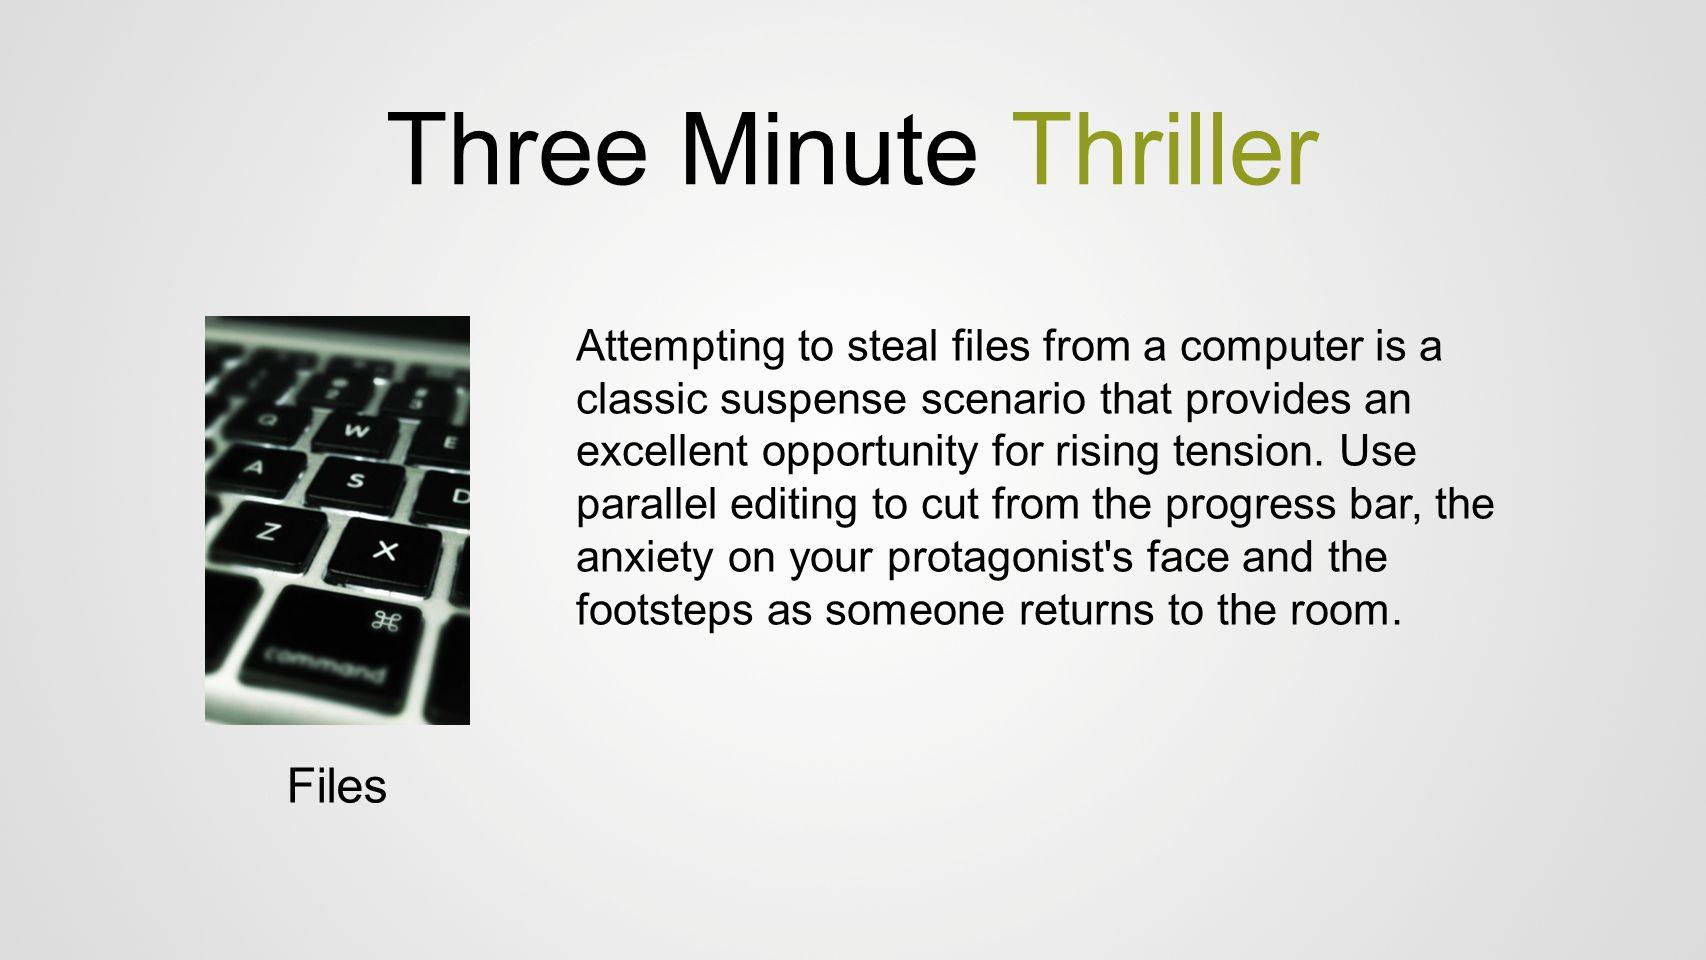 Three Minute Thriller Files